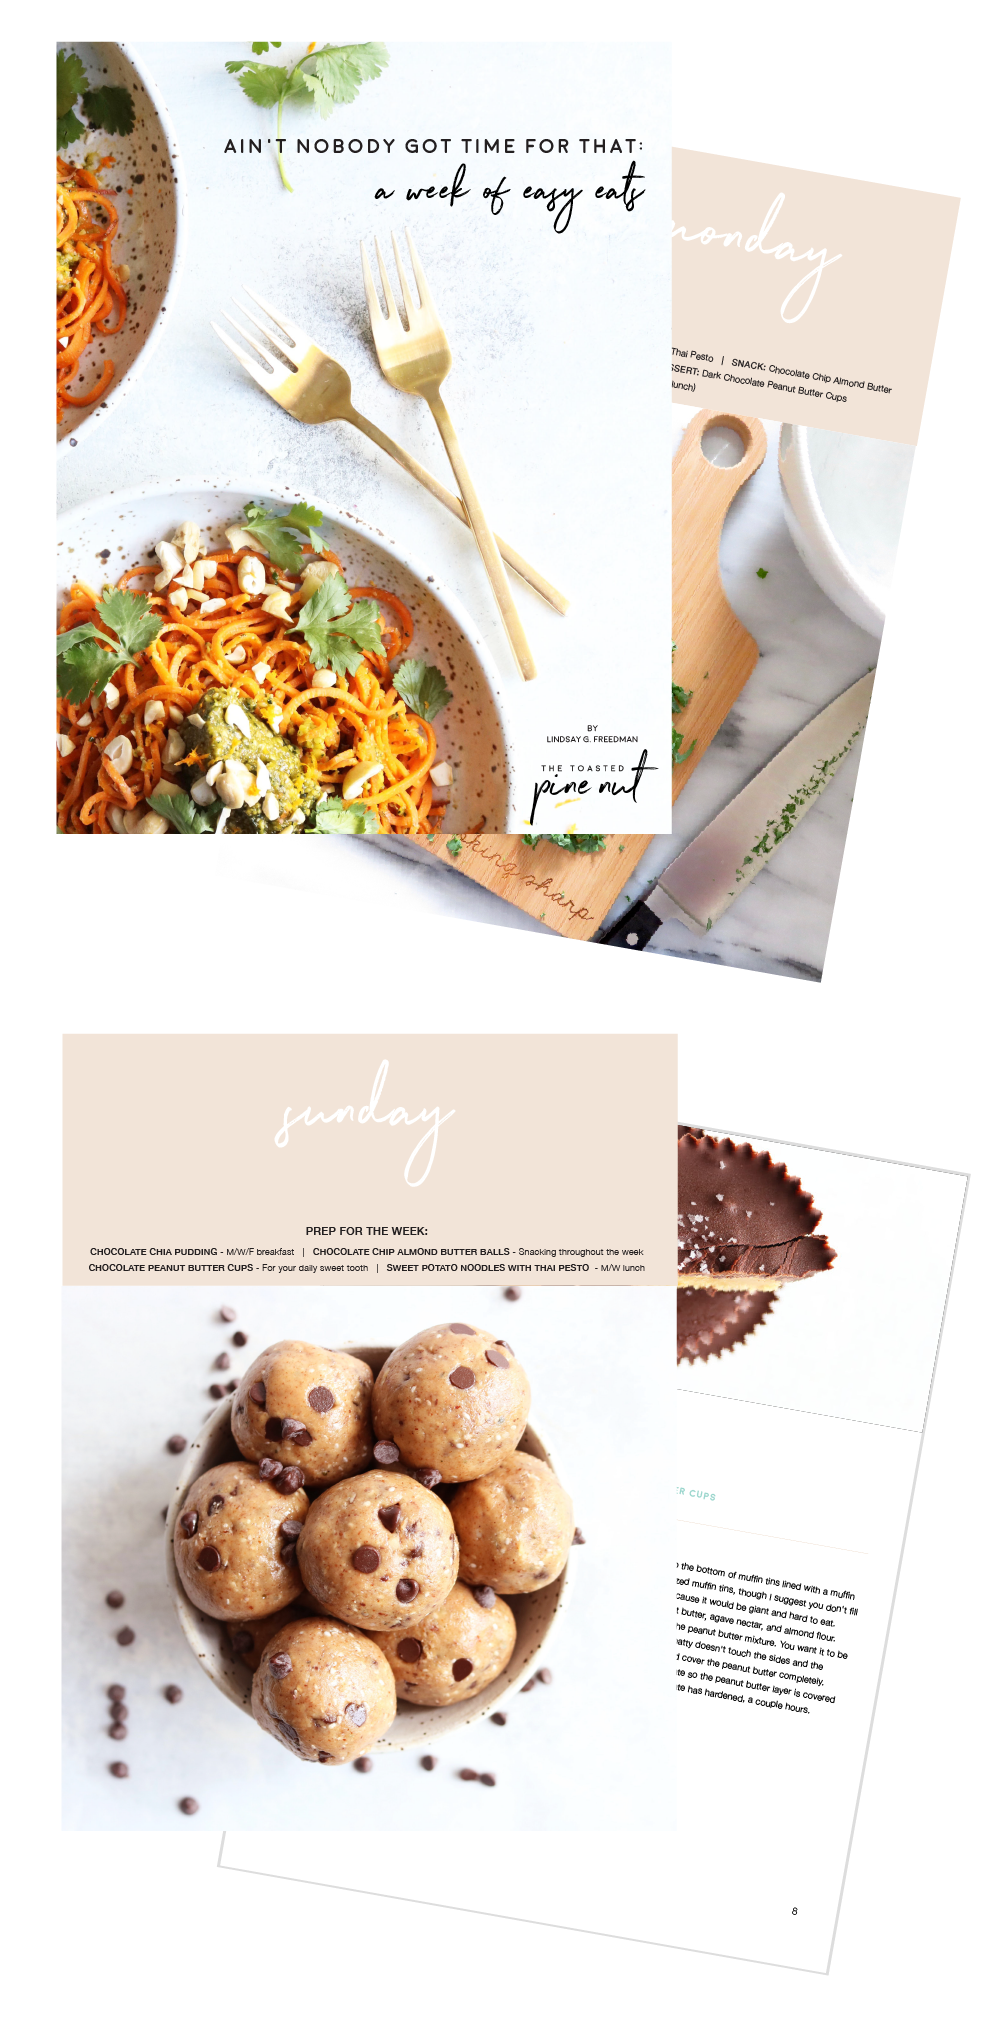 E-book Design for Food Bloggers - Food Blogger E-Book Design - Graphic Design for Food Bloggers